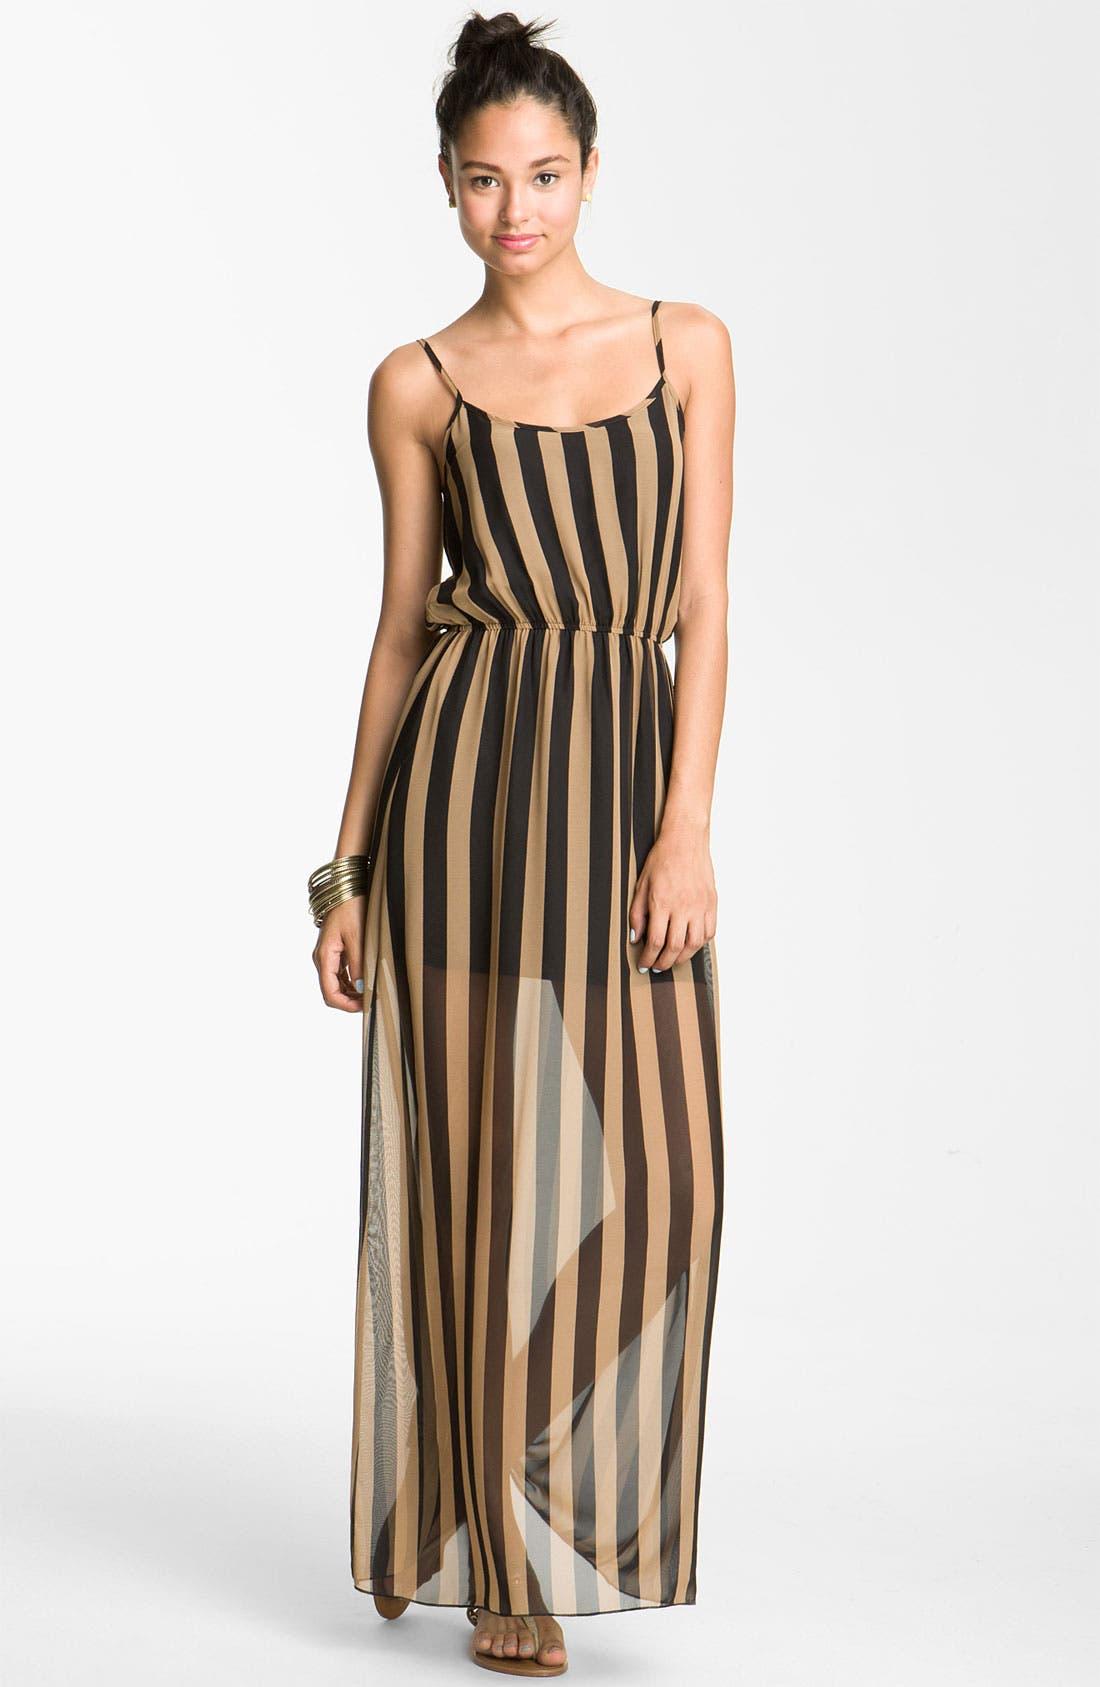 dee elle Maxi Dress,                             Main thumbnail 1, color,                             001